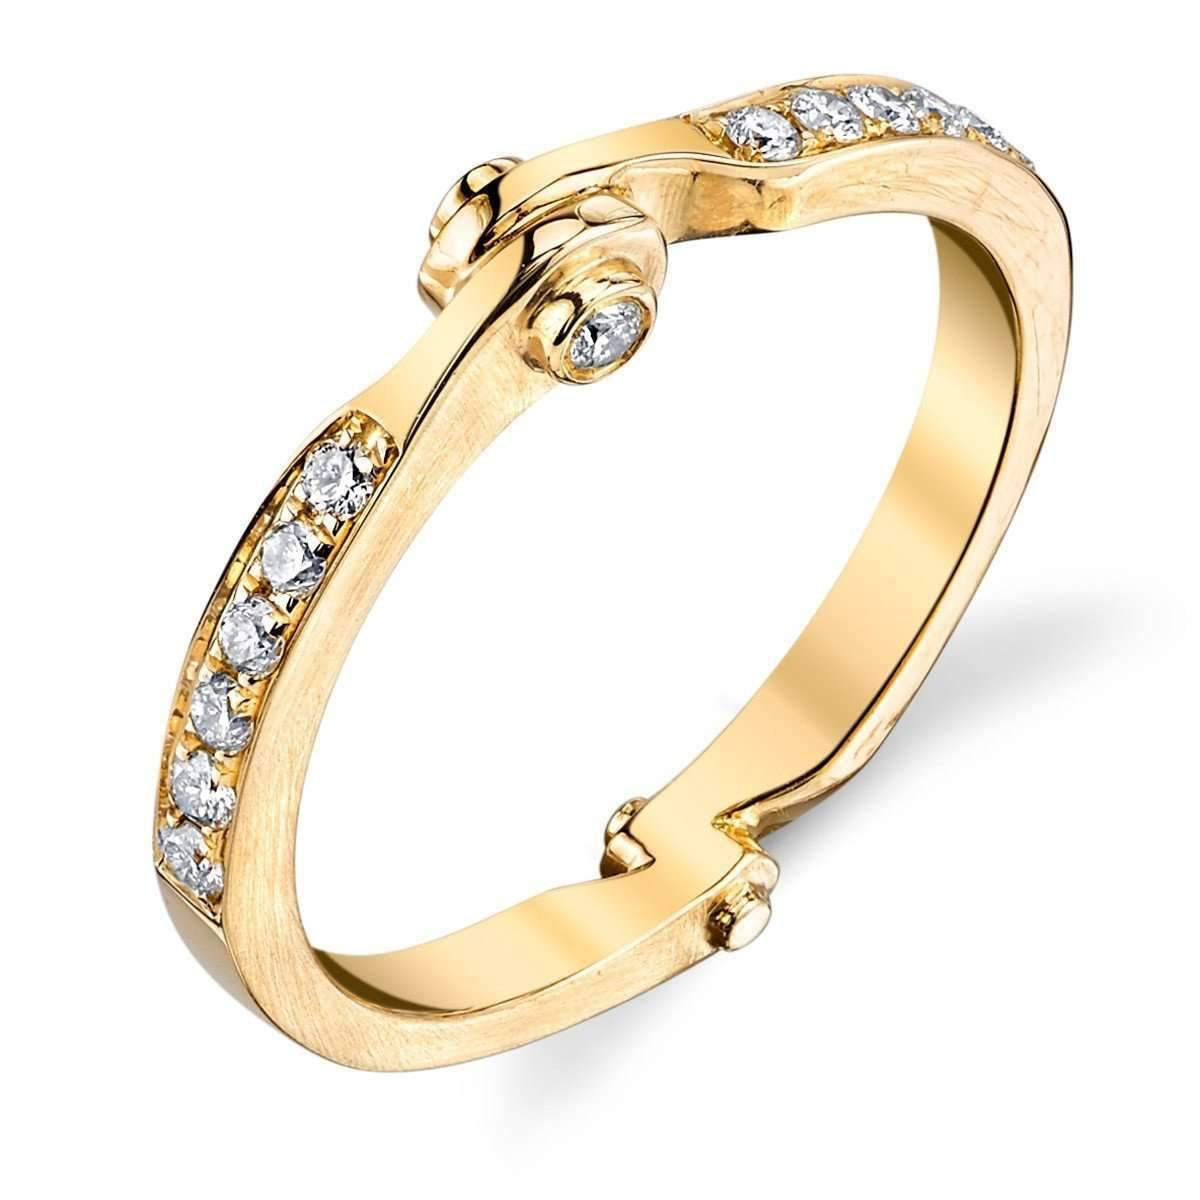 Borgioni Handcuff Chain Ring in Yellow Gold - UK N 1/2 - US 6 3/4 - EU 54 1/2 6Hw5EENr